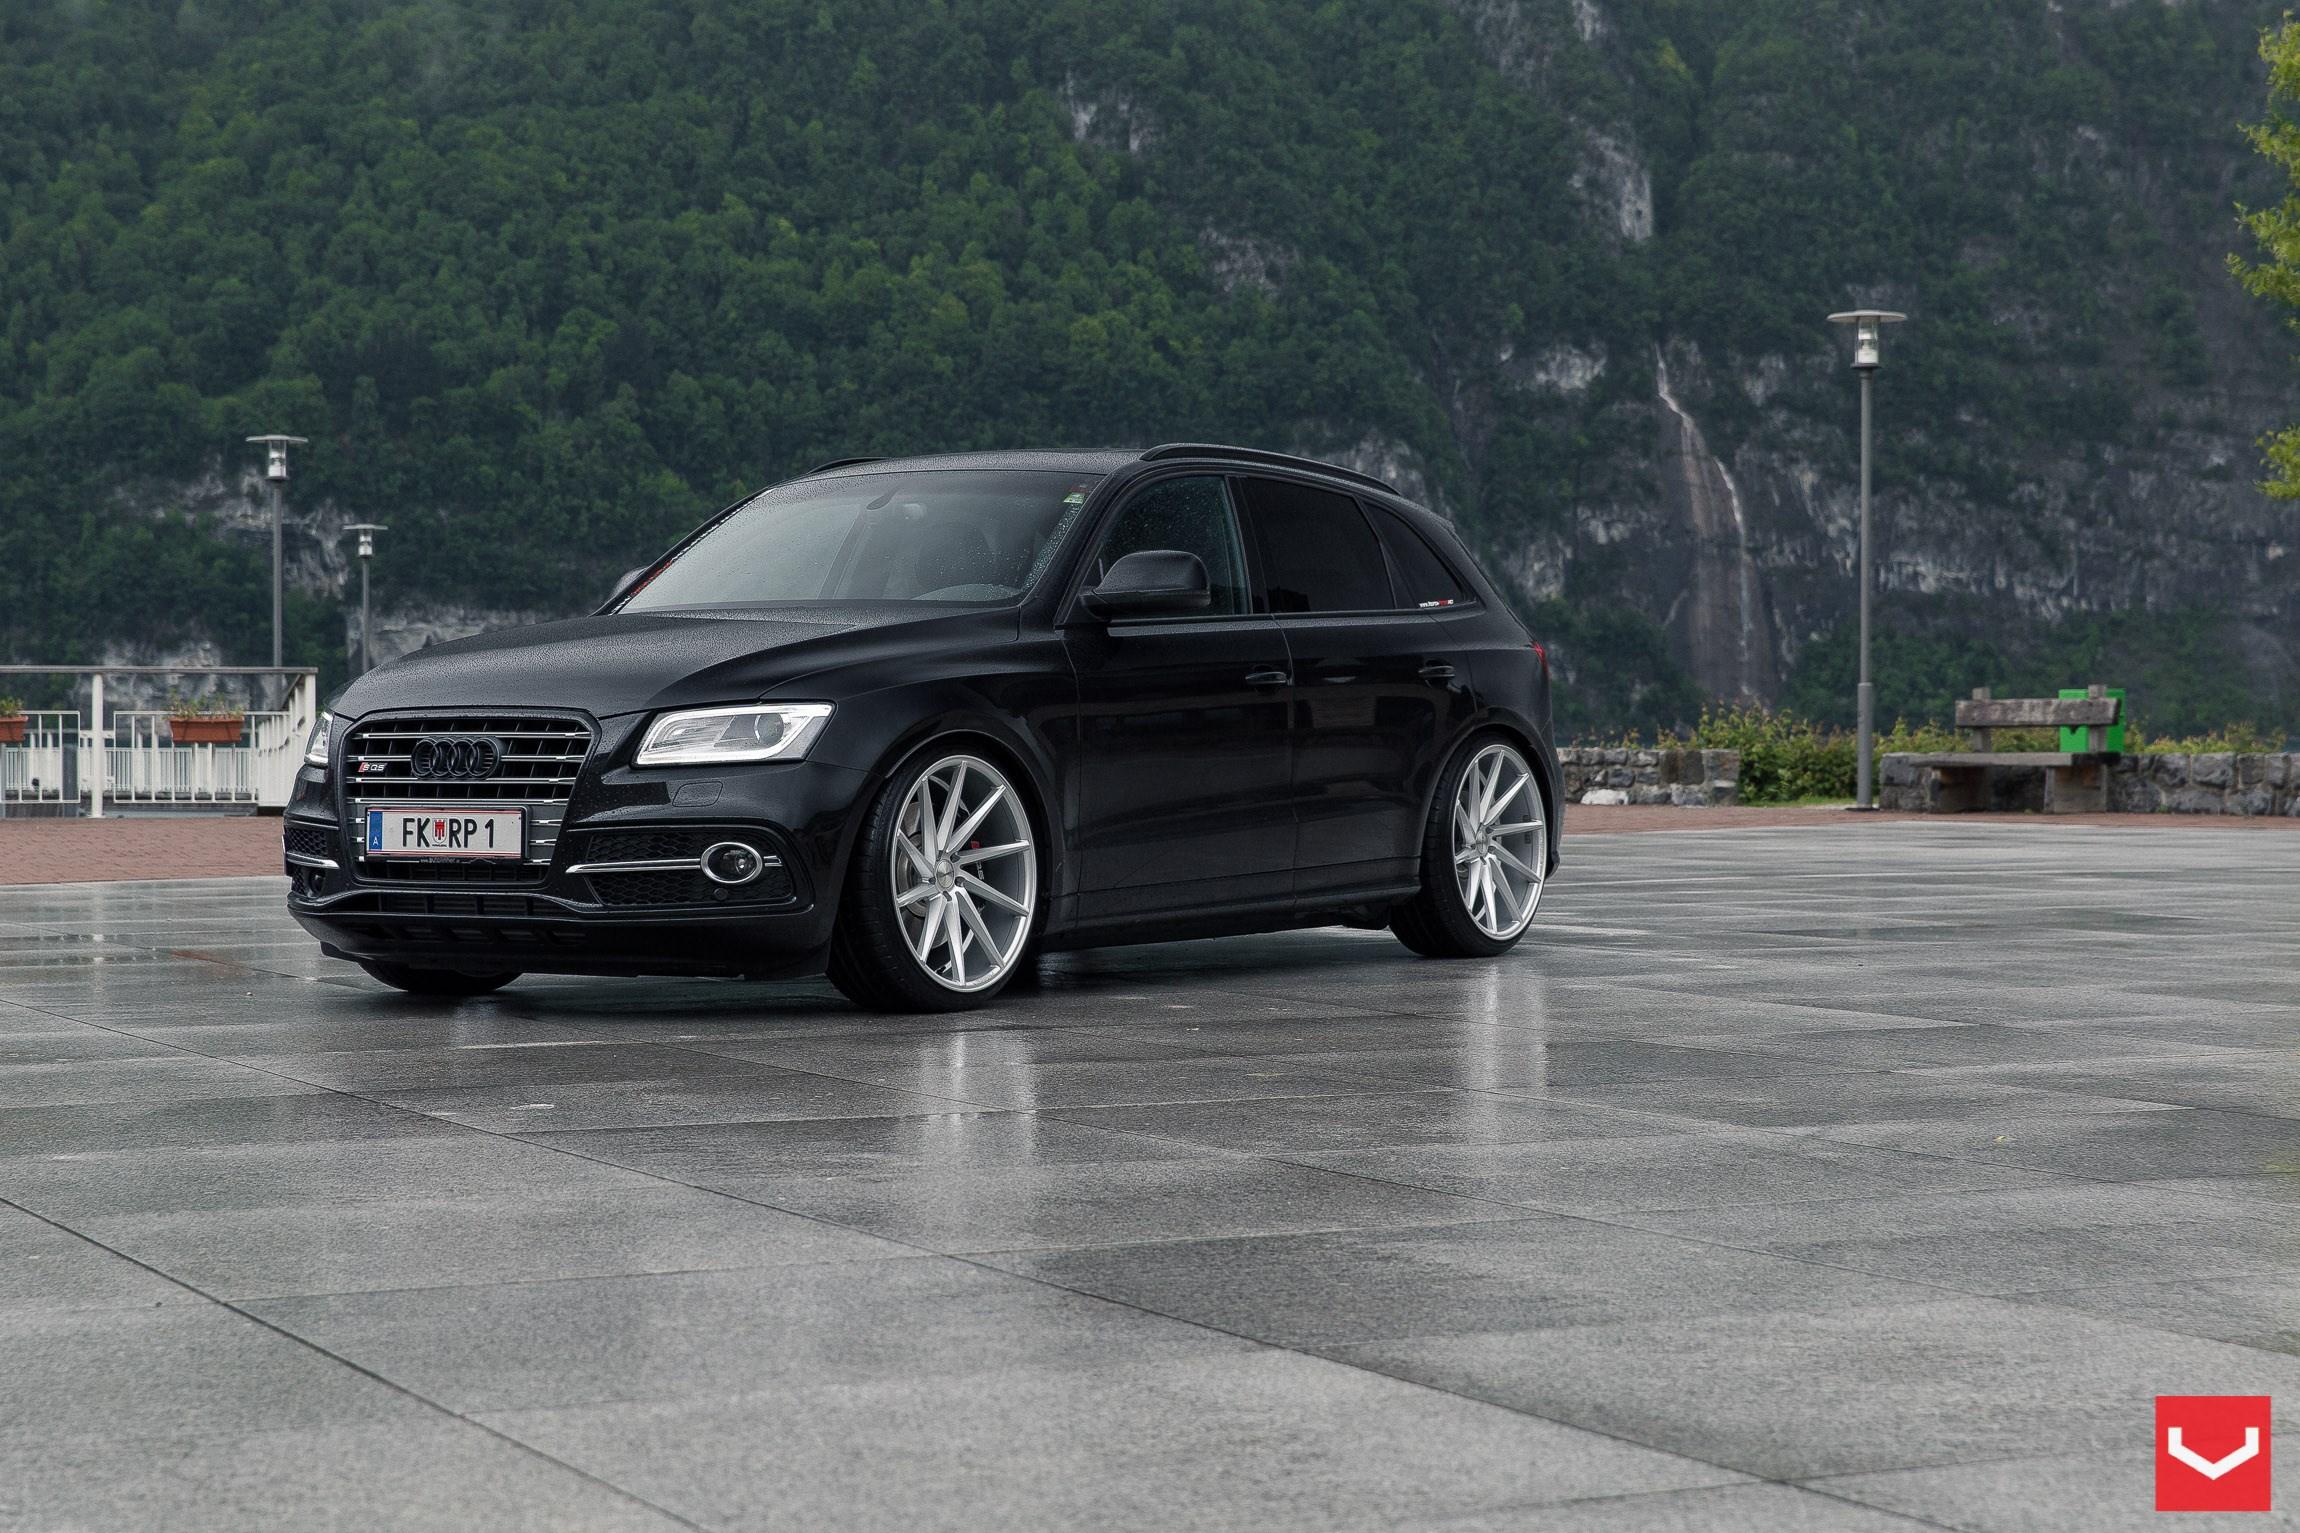 Audi Sq5 Vossen Cvt Vossen Wheels